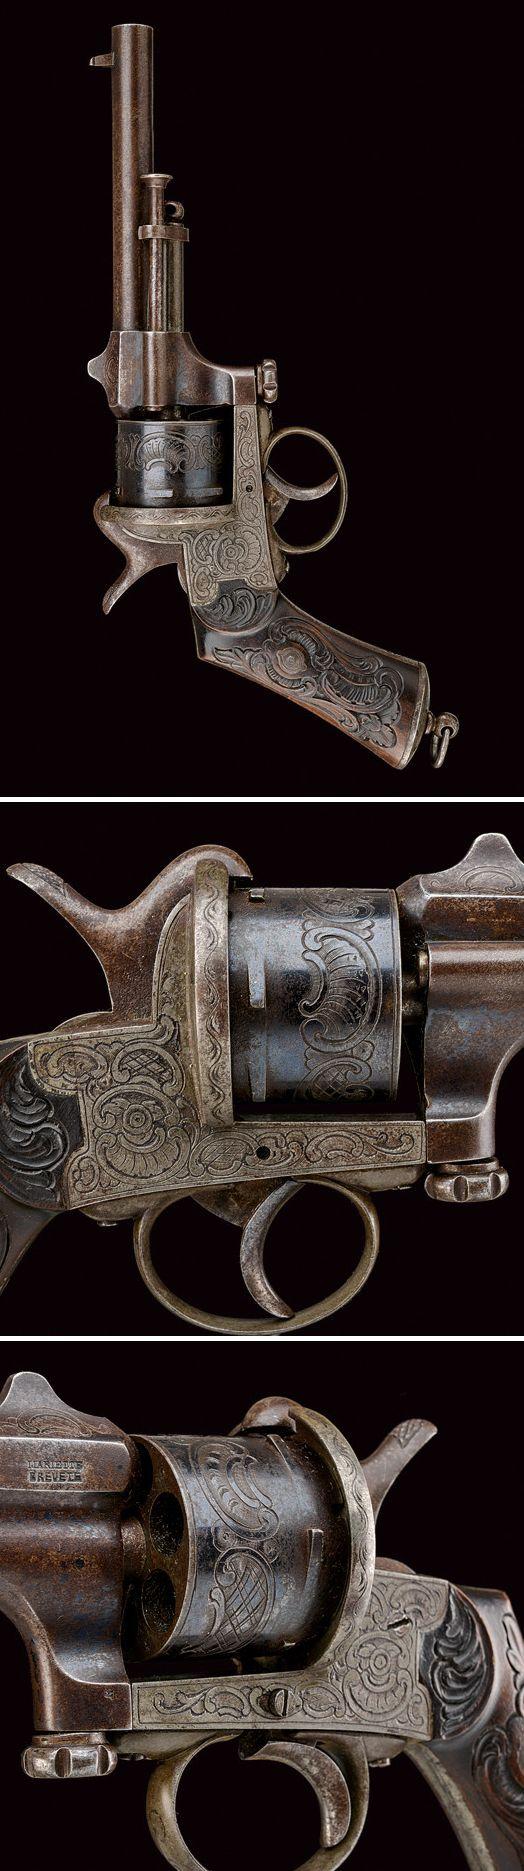 A Marietta pin-fire revolver: provenance: Belgium dating: third quarter of the 19th Century